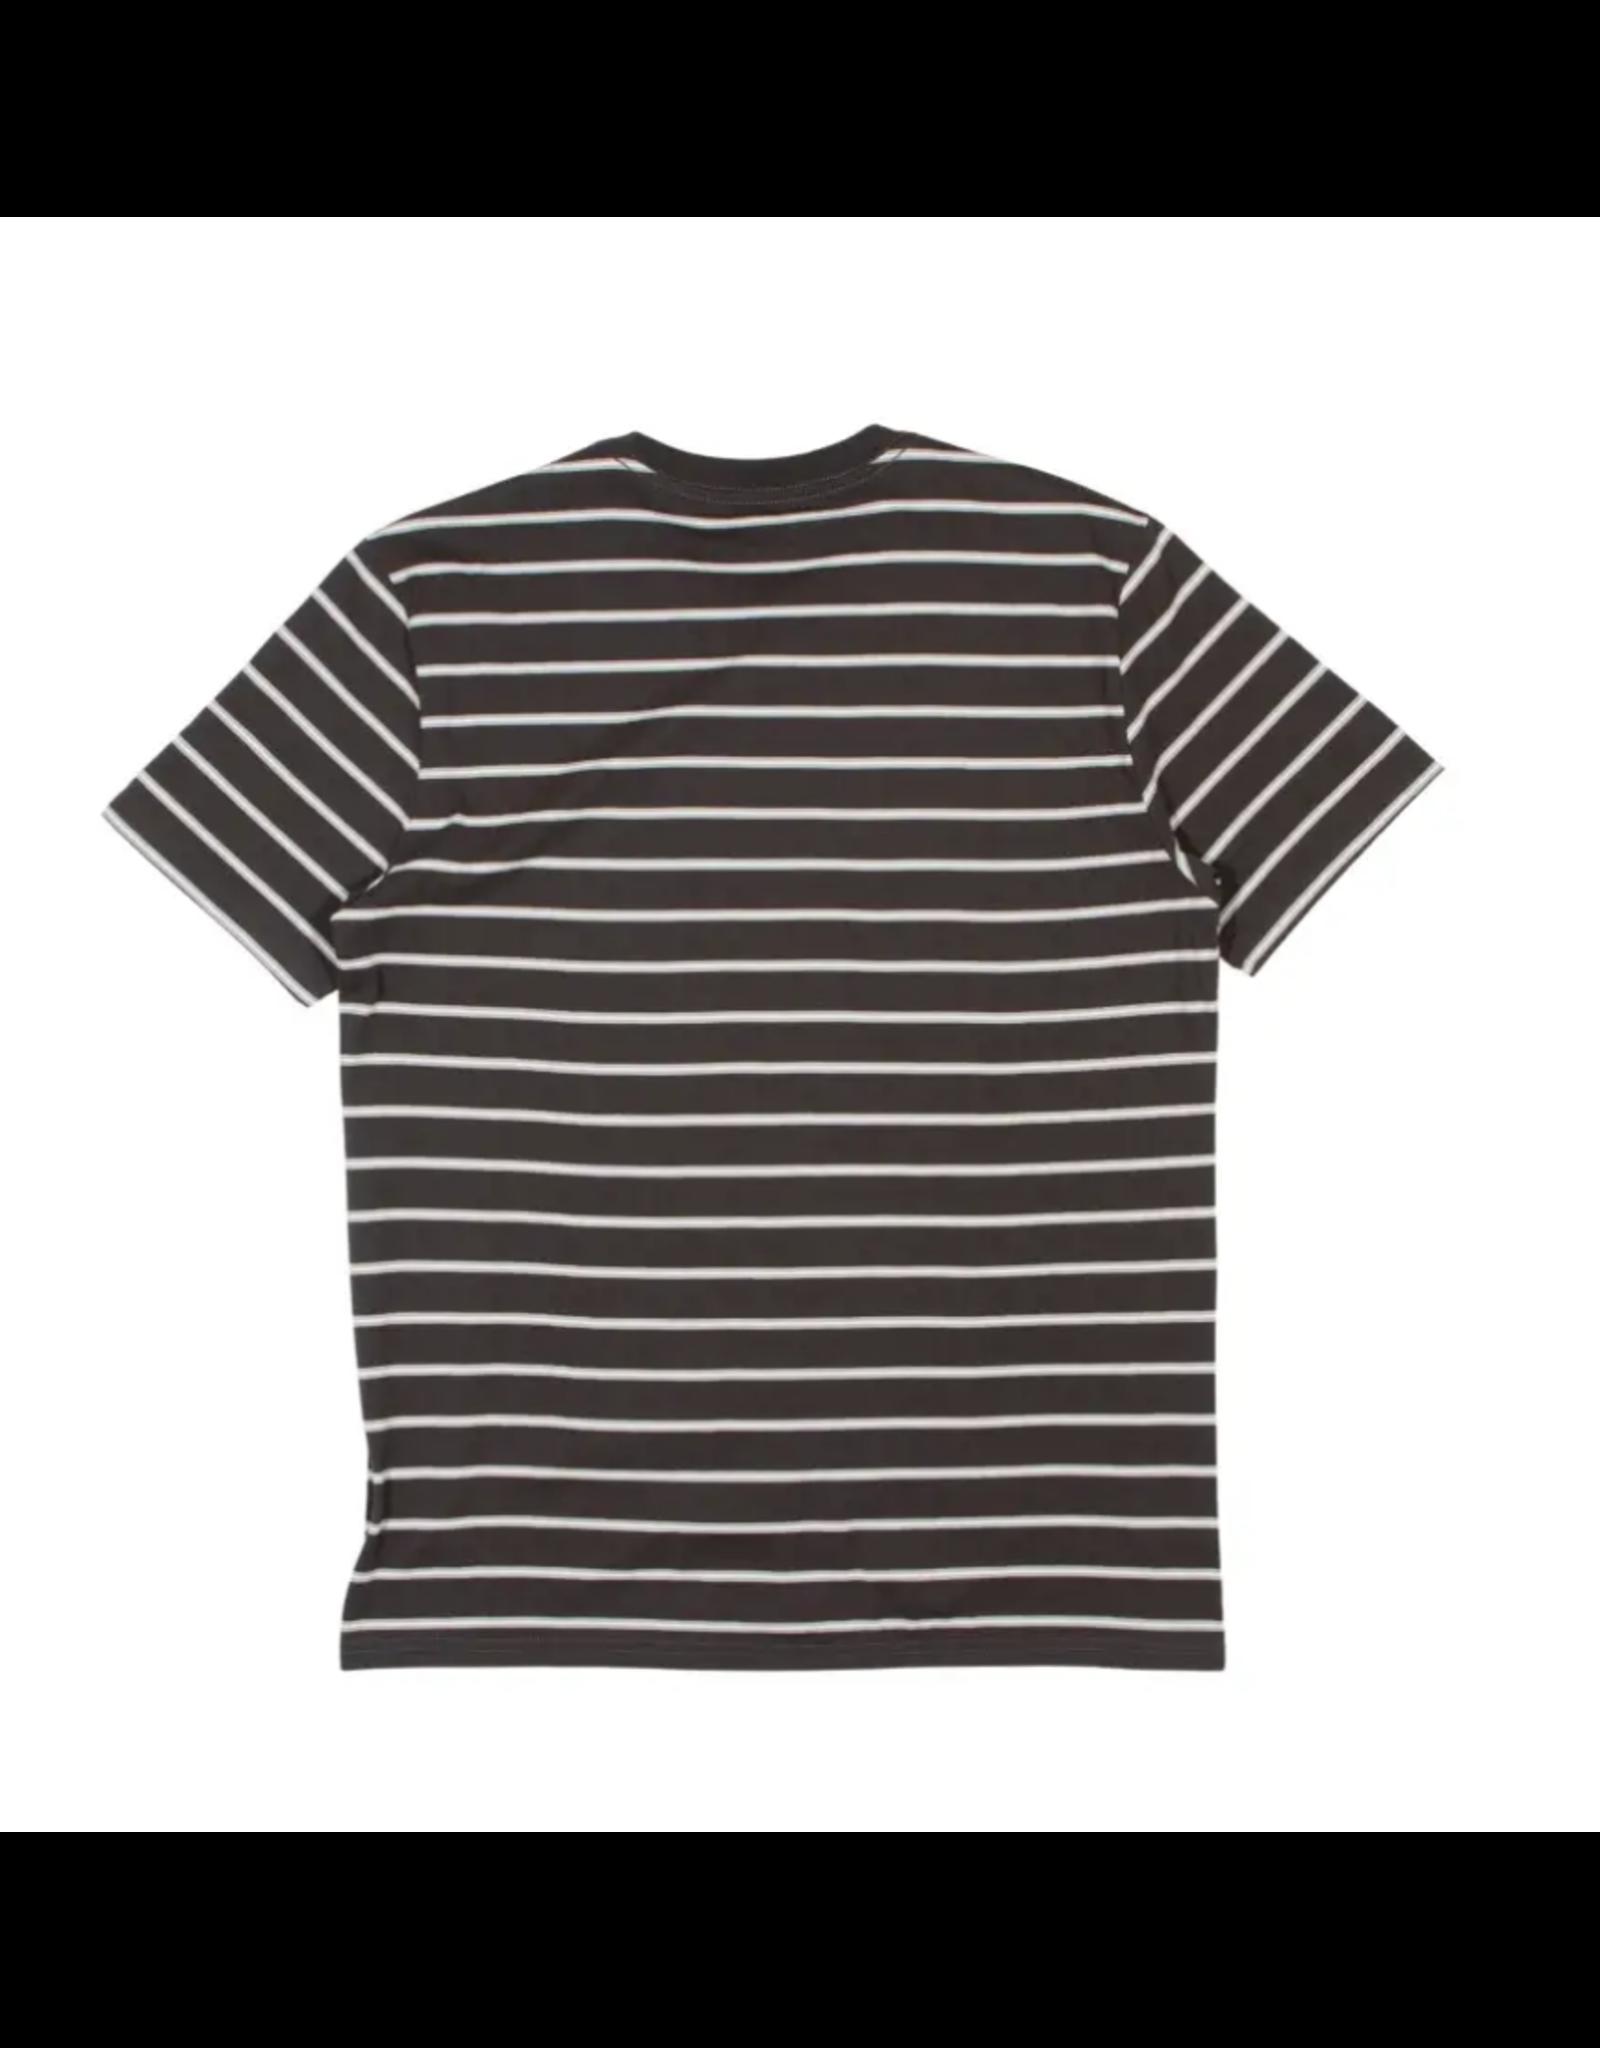 Brixton Hilt Shield Knit T-Shirt - Black